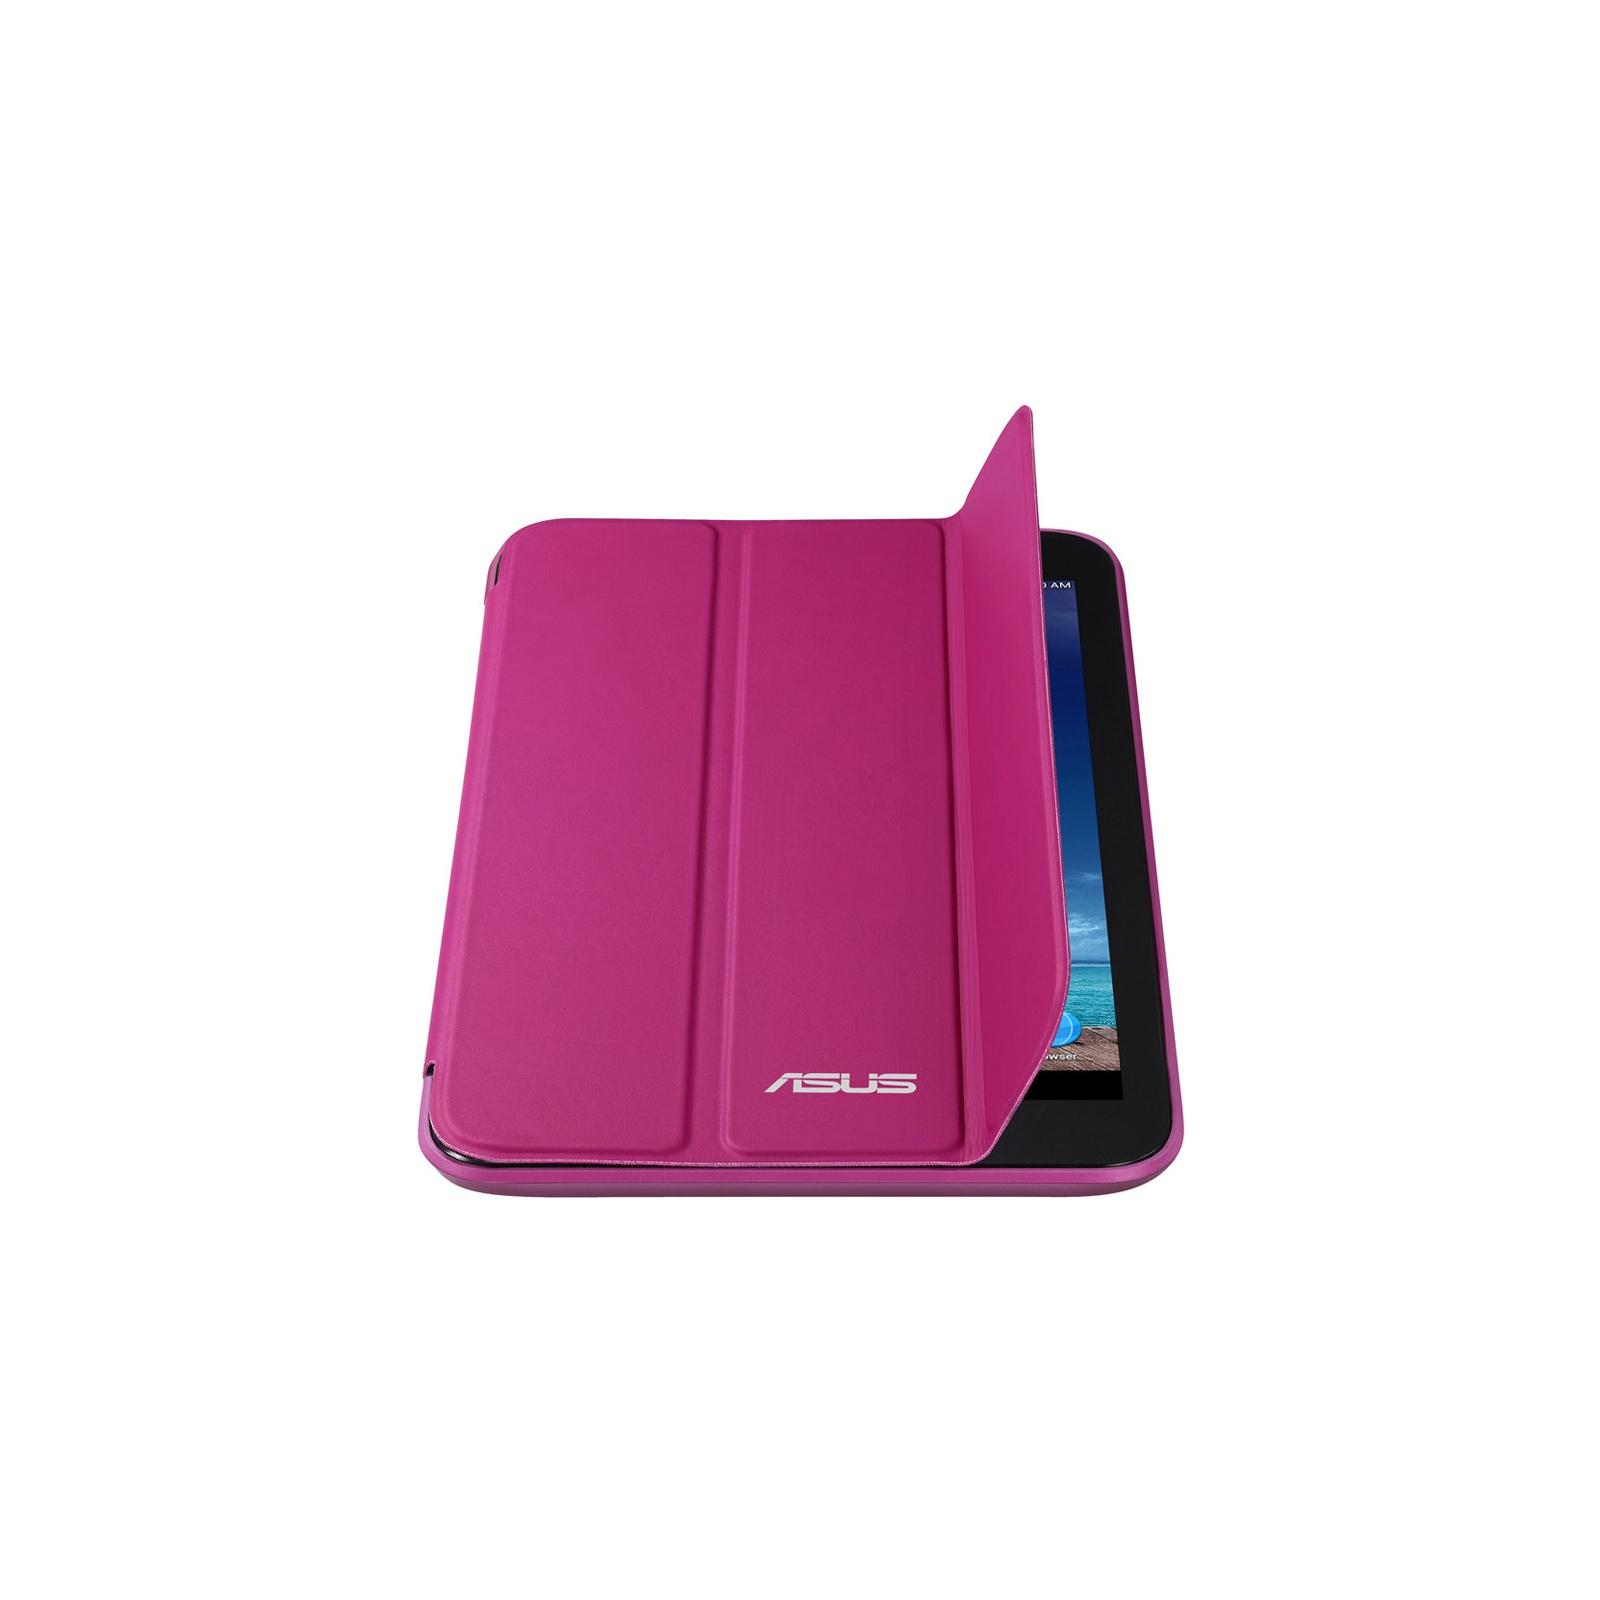 Чехол для планшета ASUS 8 ME180A TriCover RED (90XB015P-BSL0E0) изображение 3